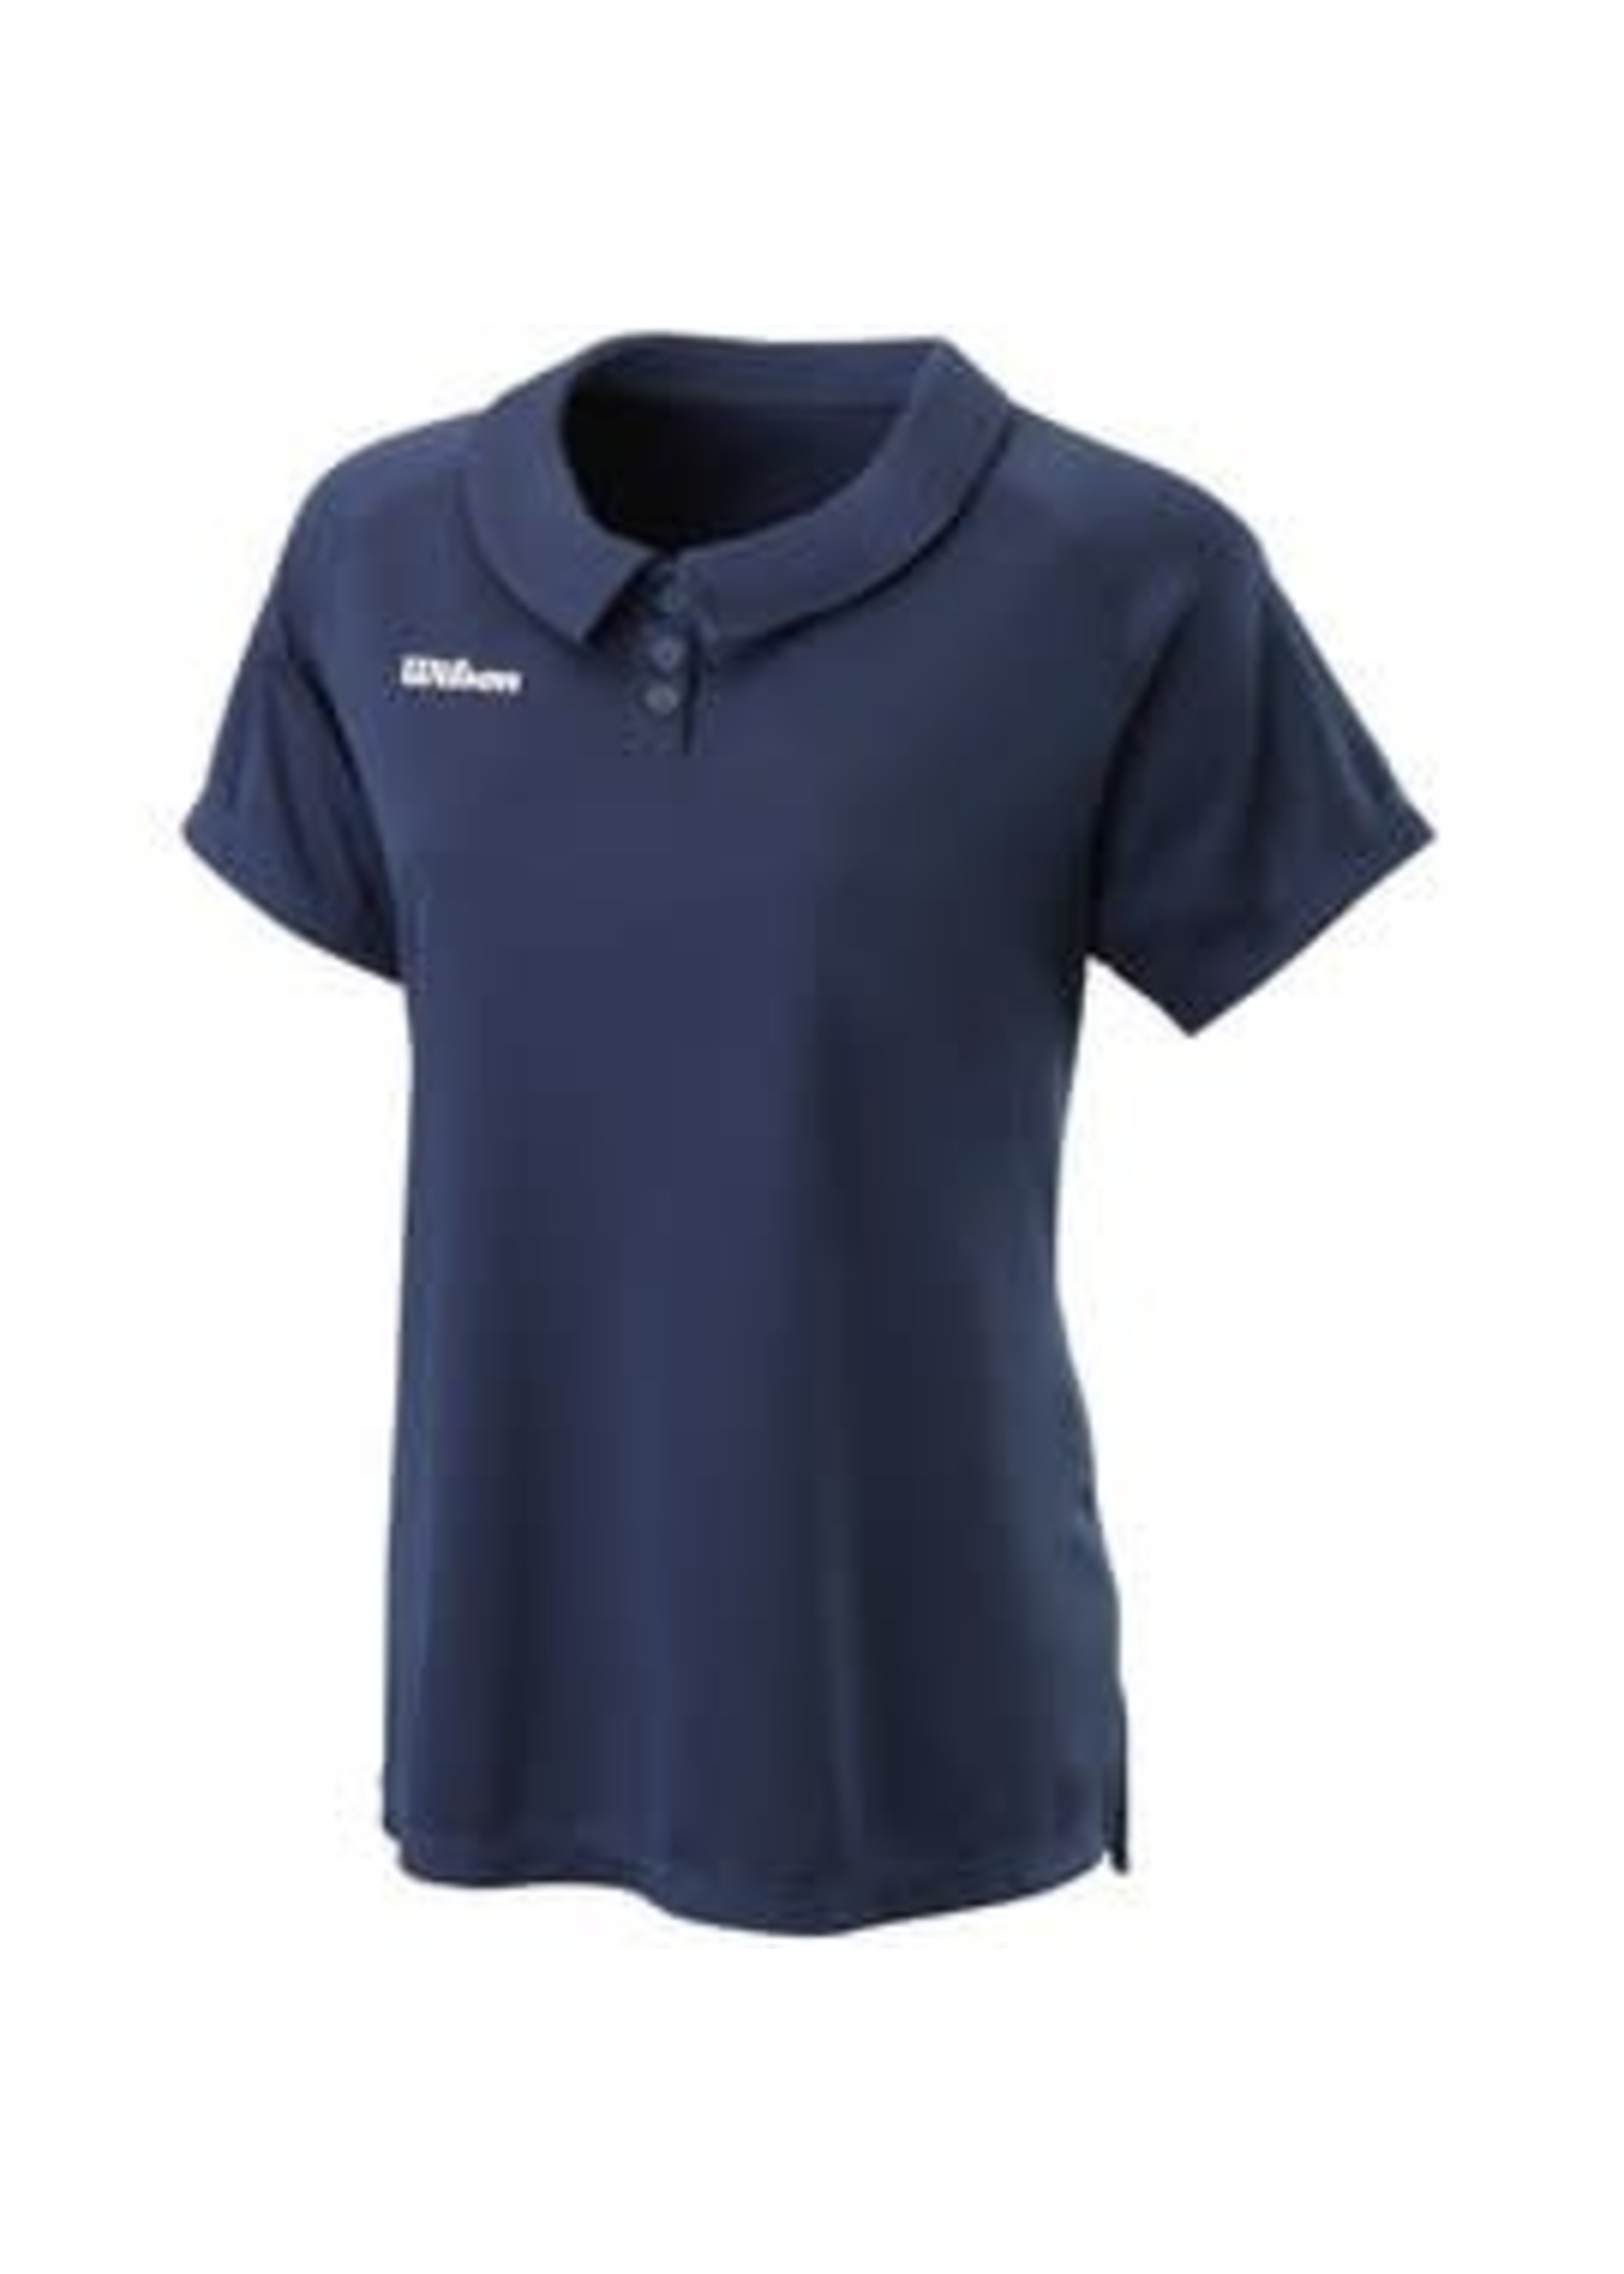 Wilson Wilson Team 2 Ladies Polo Shirt (2021) Navy